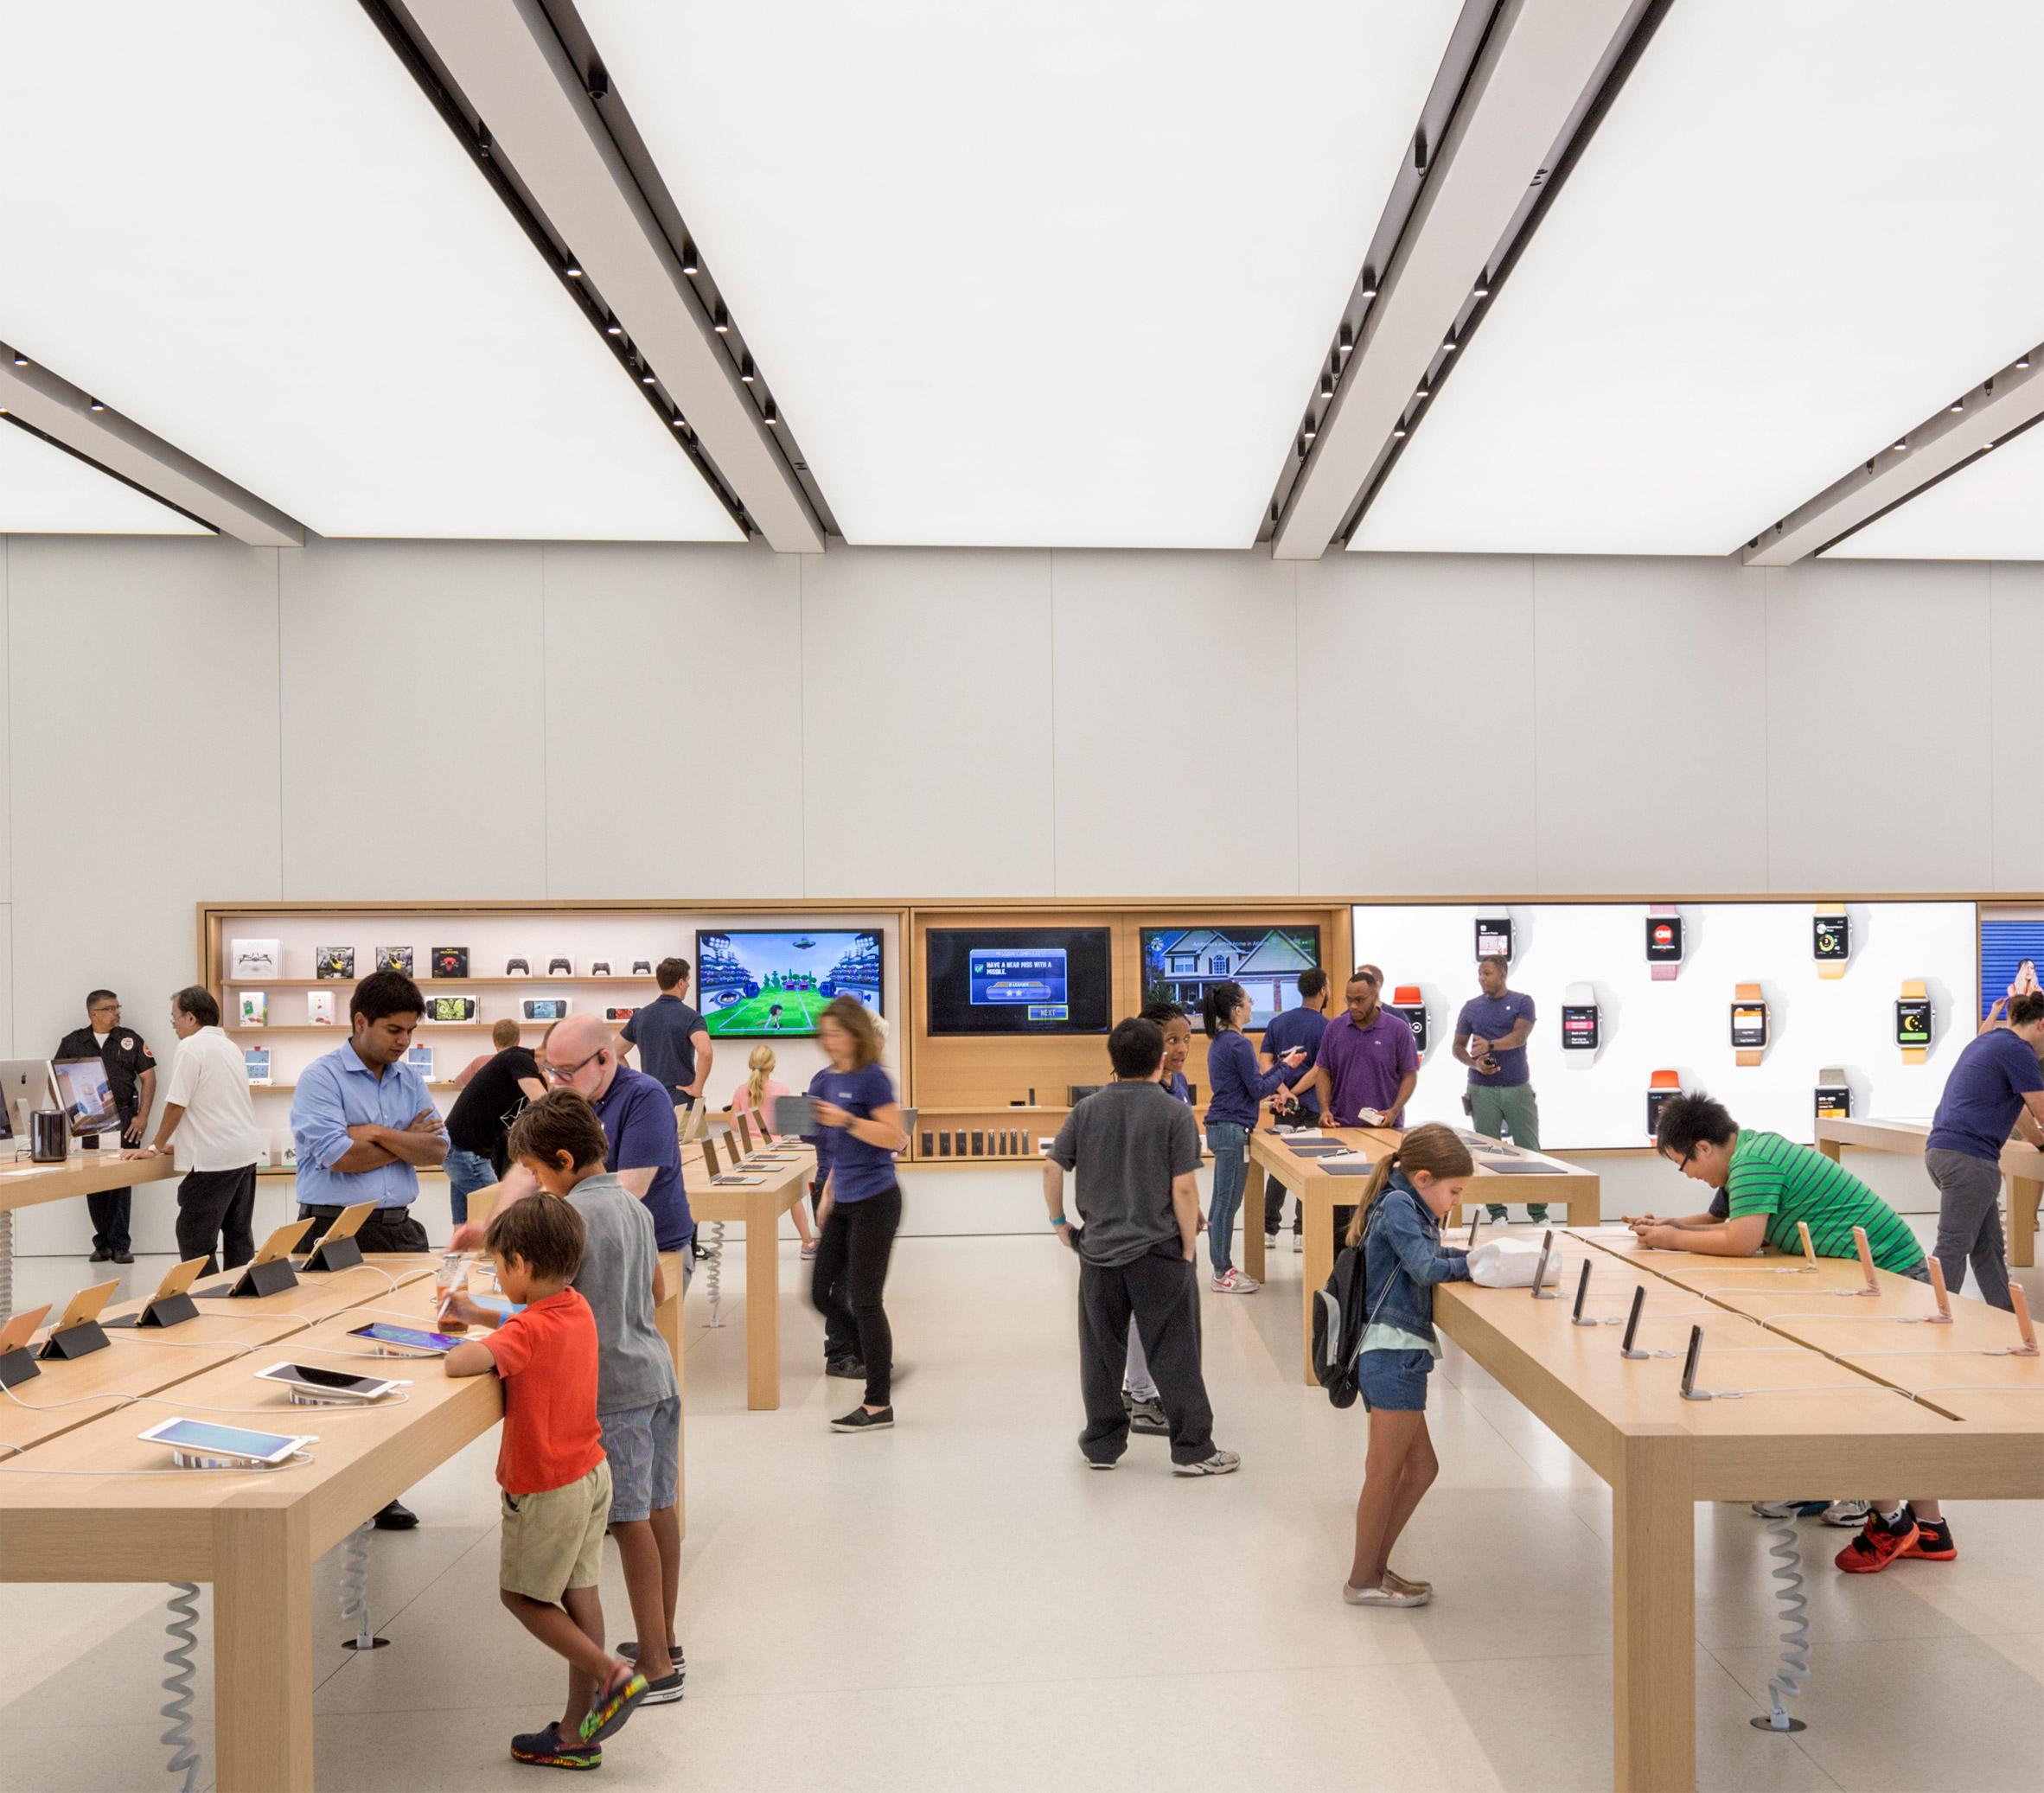 Apple Store by Bohlin Cywinski Jackson opens in Calatrava's Oculus